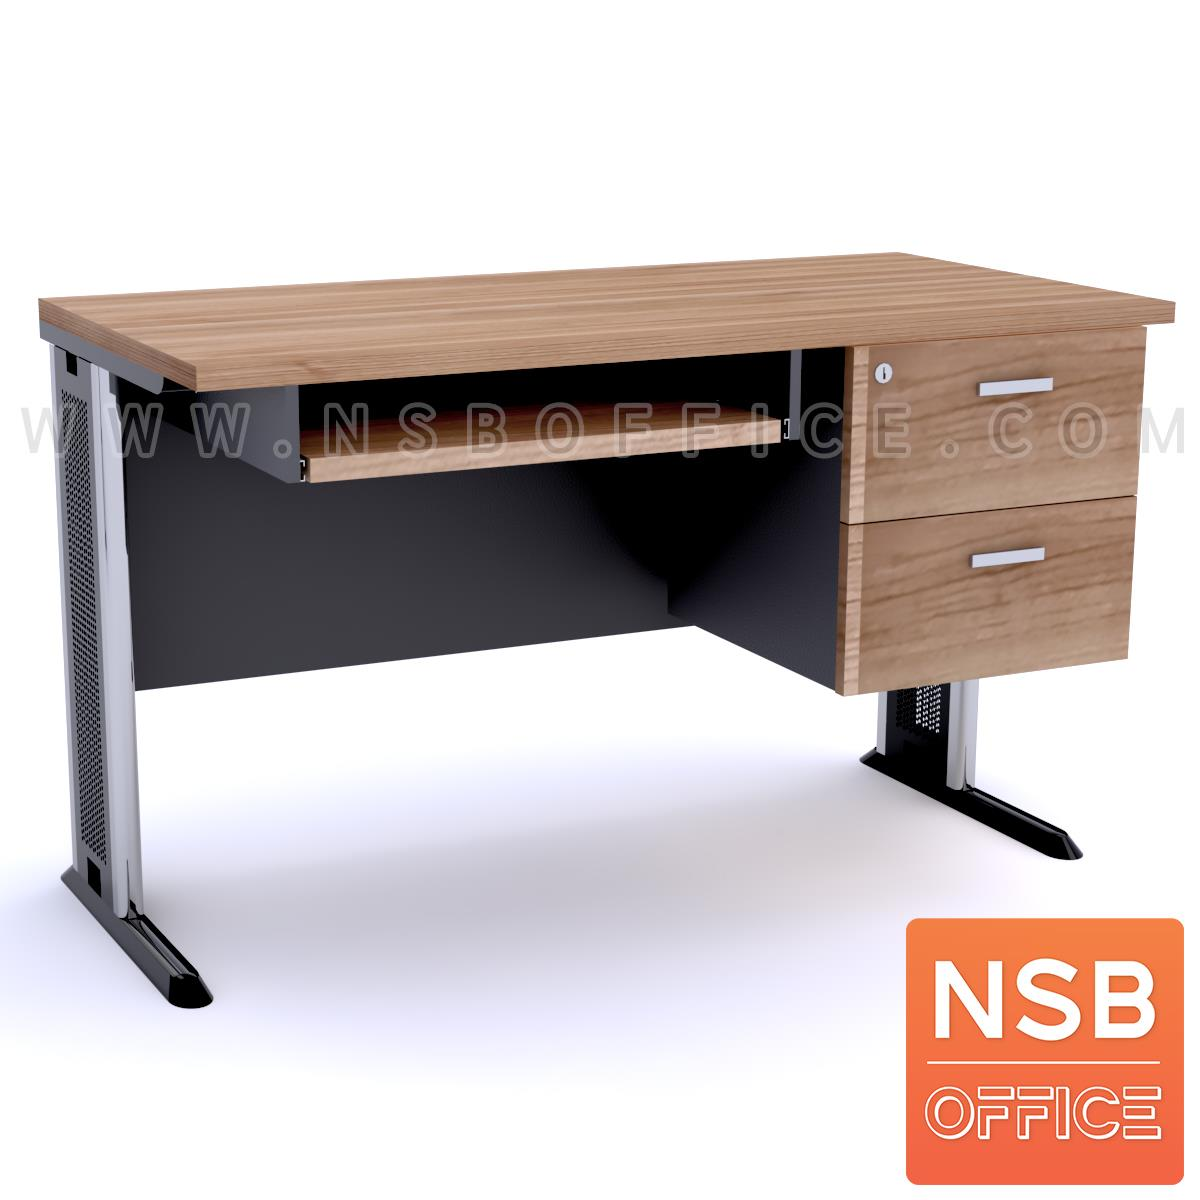 A10A038:โต๊ะคอมพิวเตอร์ 2 ลิ้นชัก พร้อมรางคีย์บอร์ด  ขนาด 120W ,135W ,150W ,180W cm. ขาเหล็กตัวแอล